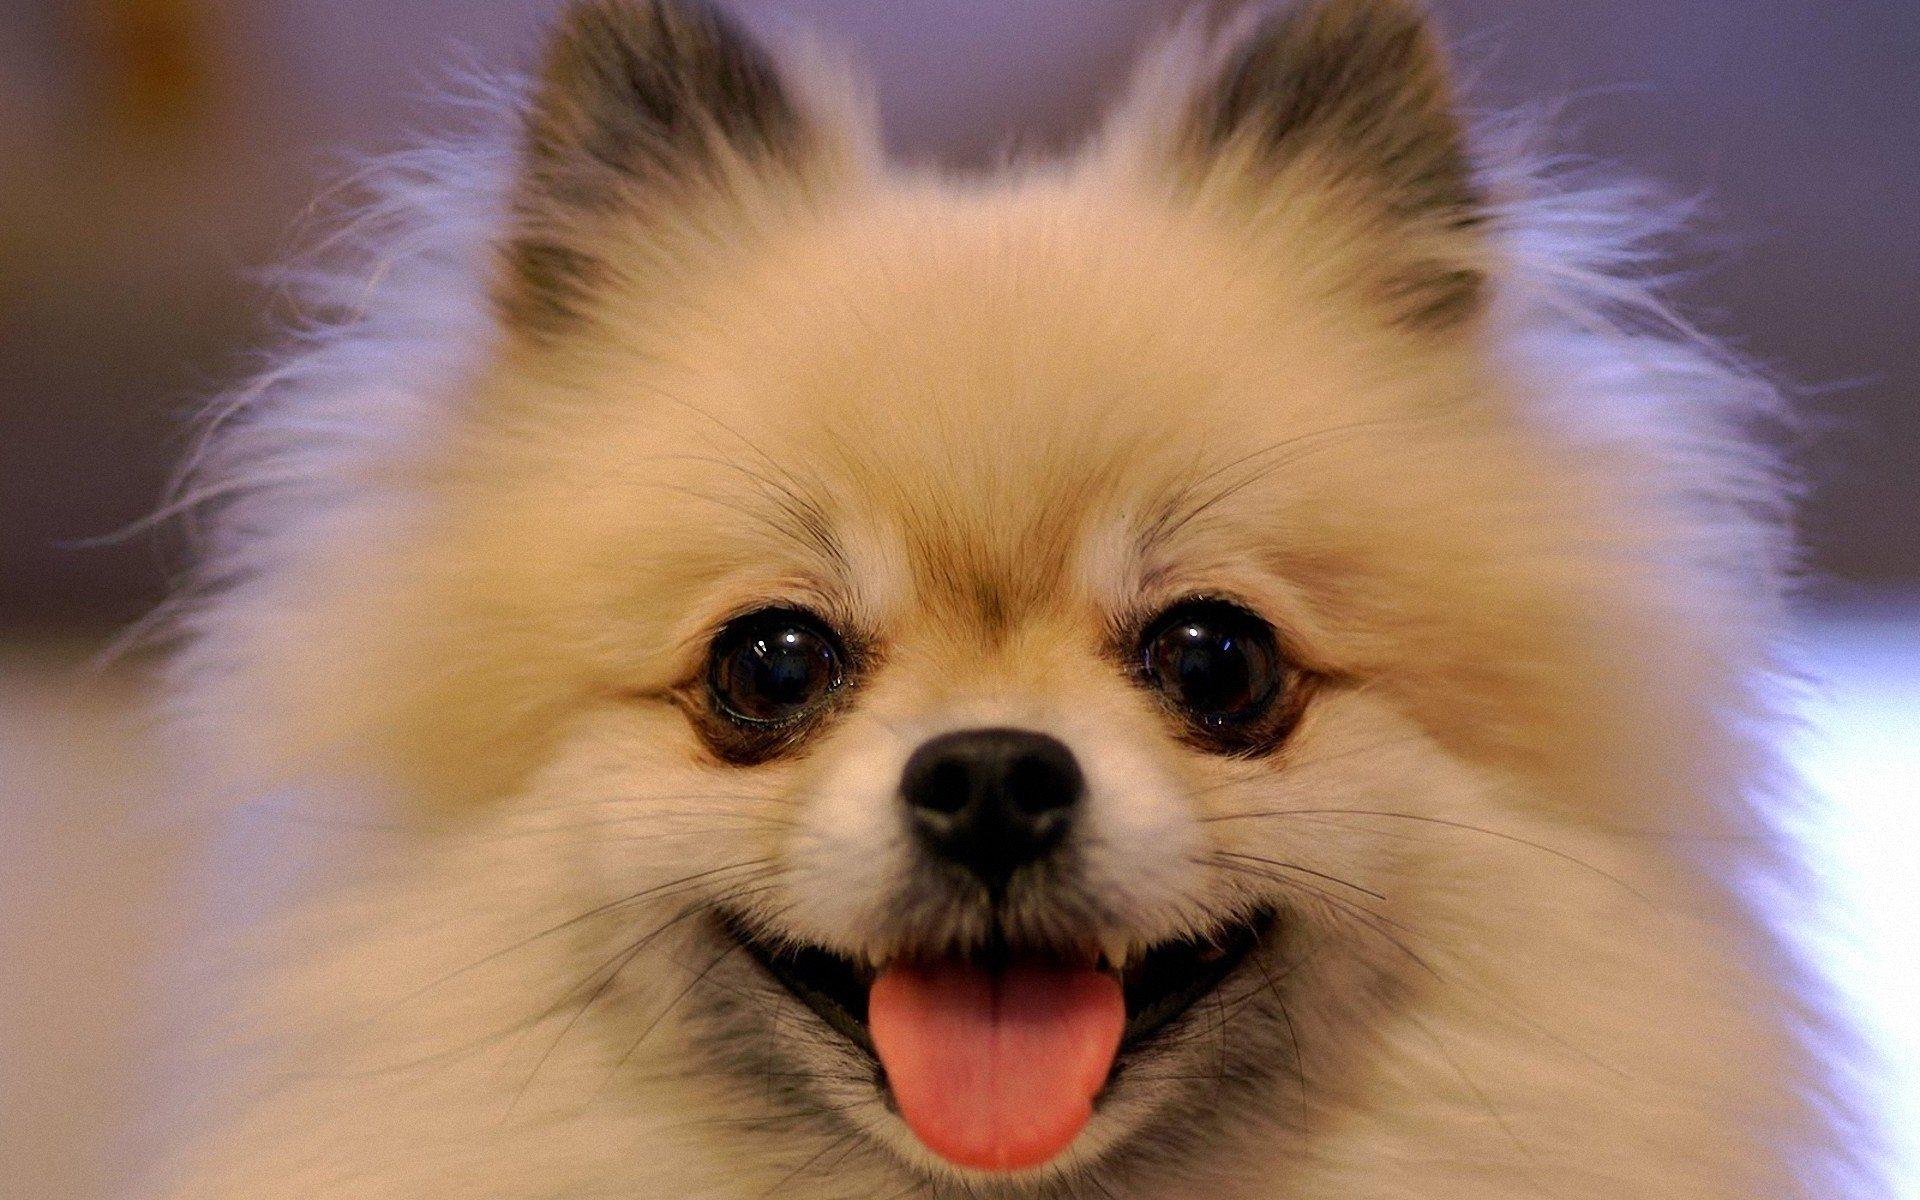 pomeranian-smile-face_96217-1920x1200.jpg